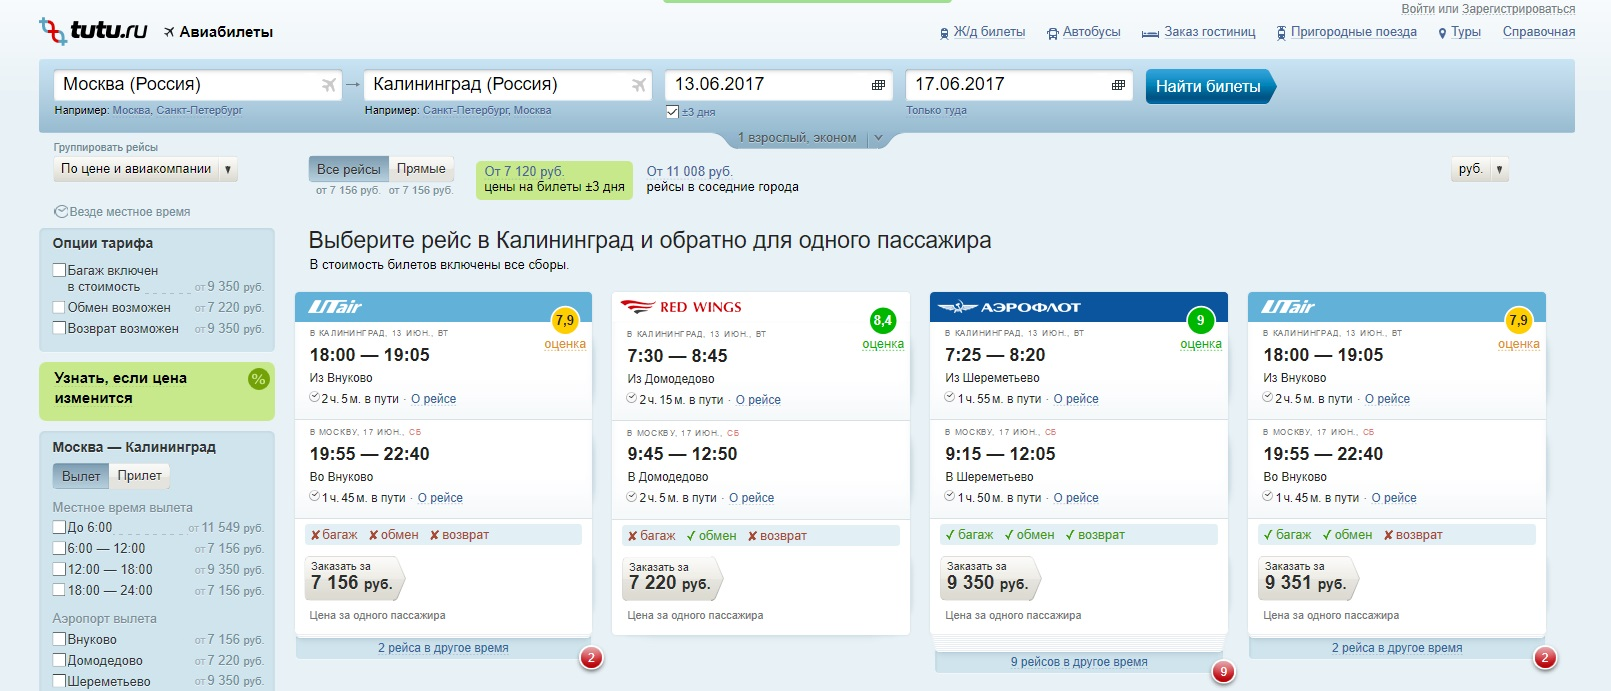 Ош — Москва: авиабилеты от 33373 тенге, расписание